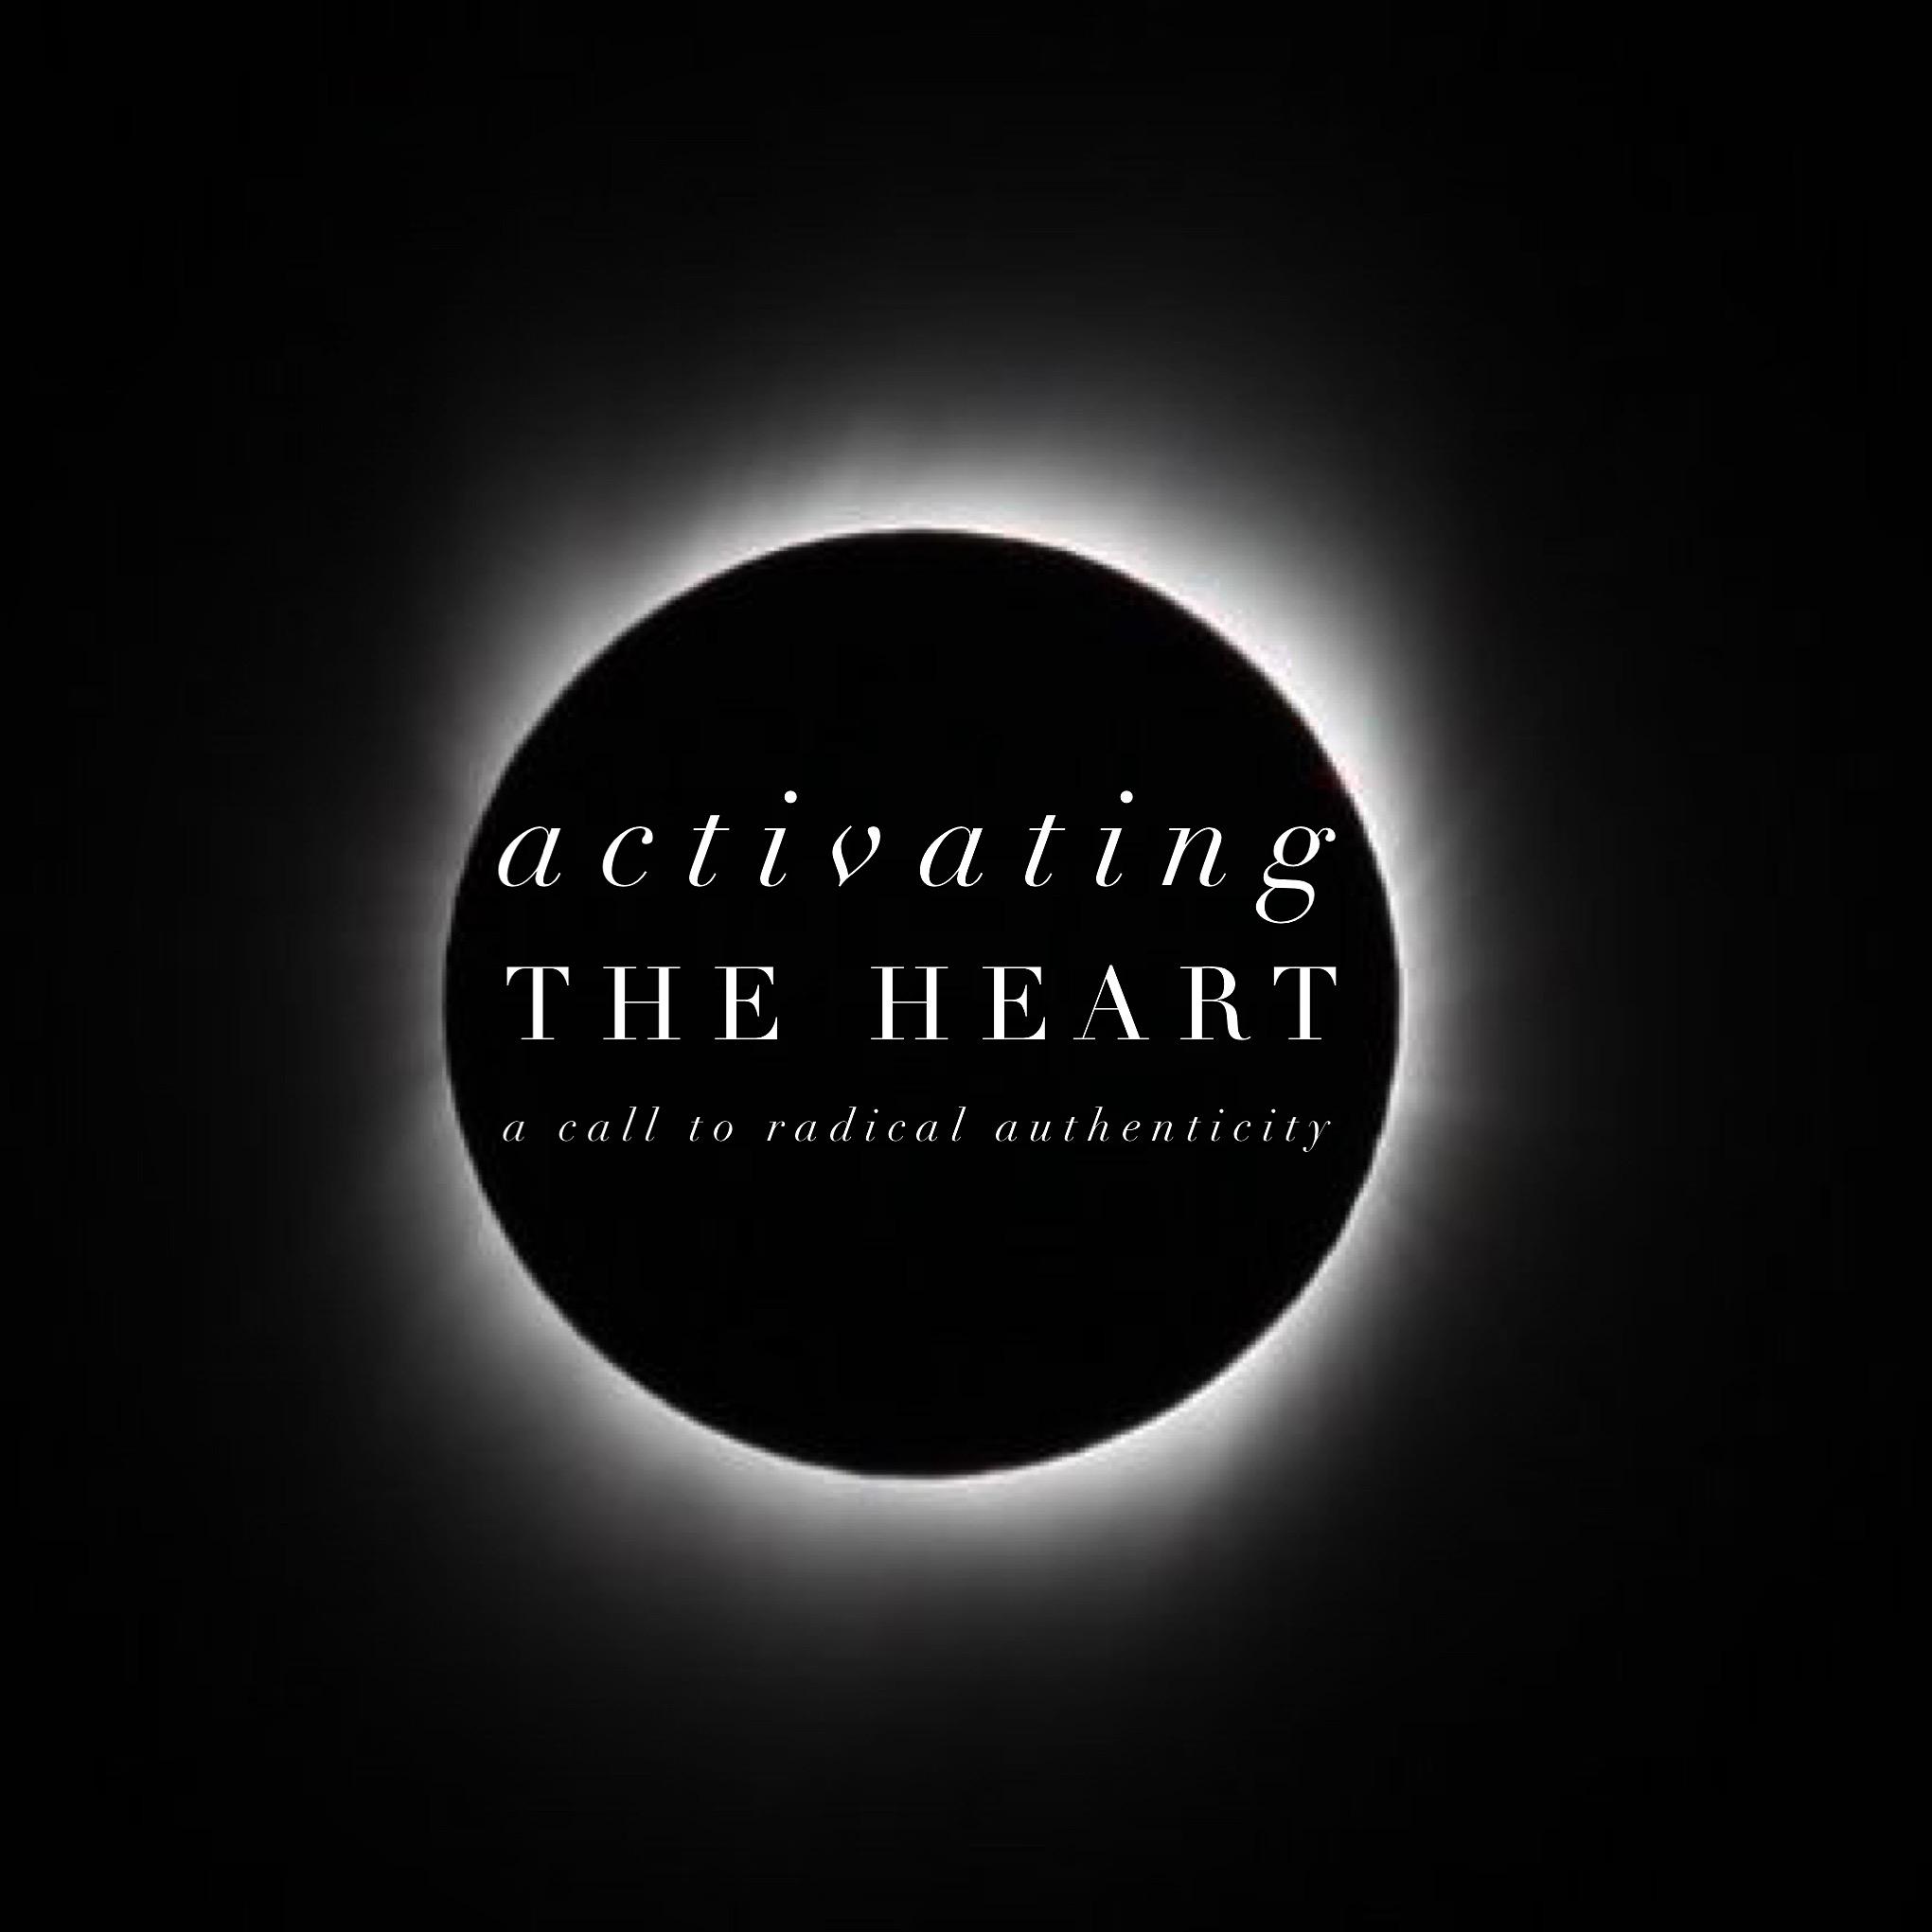 activating the heart logo.JPG